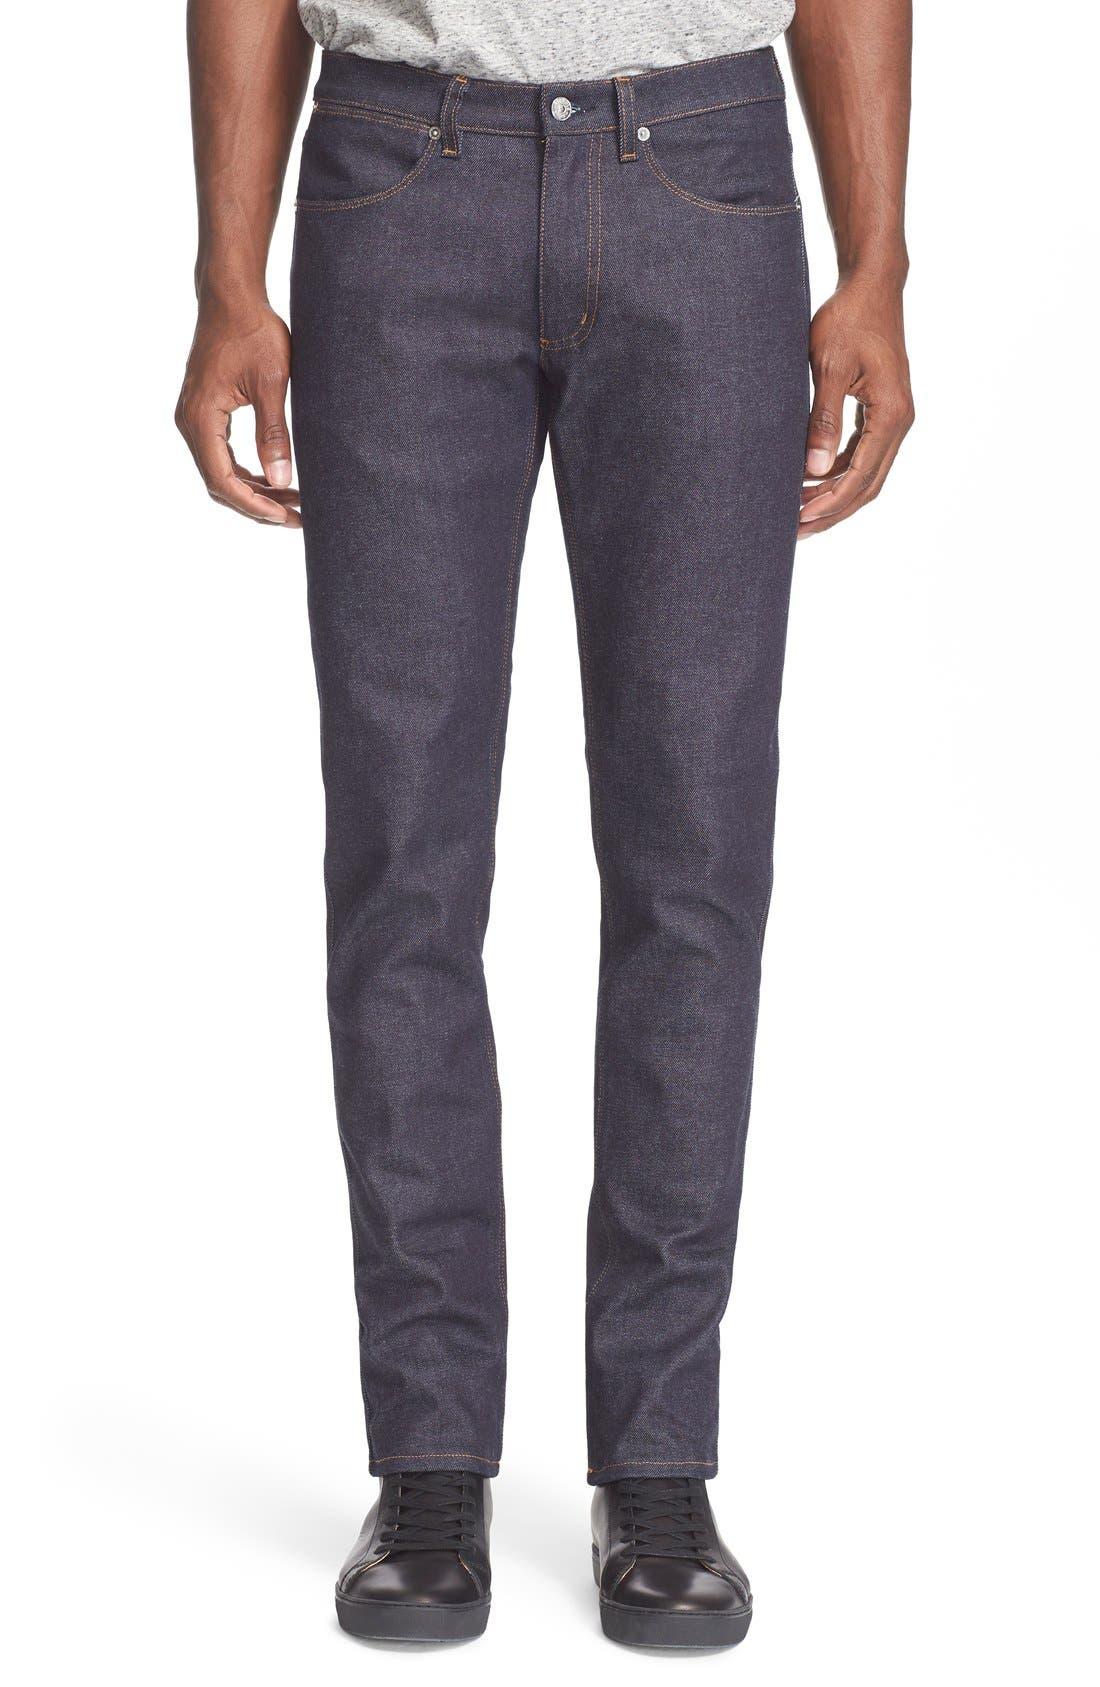 Alternate Image 1 Selected - ACNE Studios 'Max' Slim Straight Leg Jeans